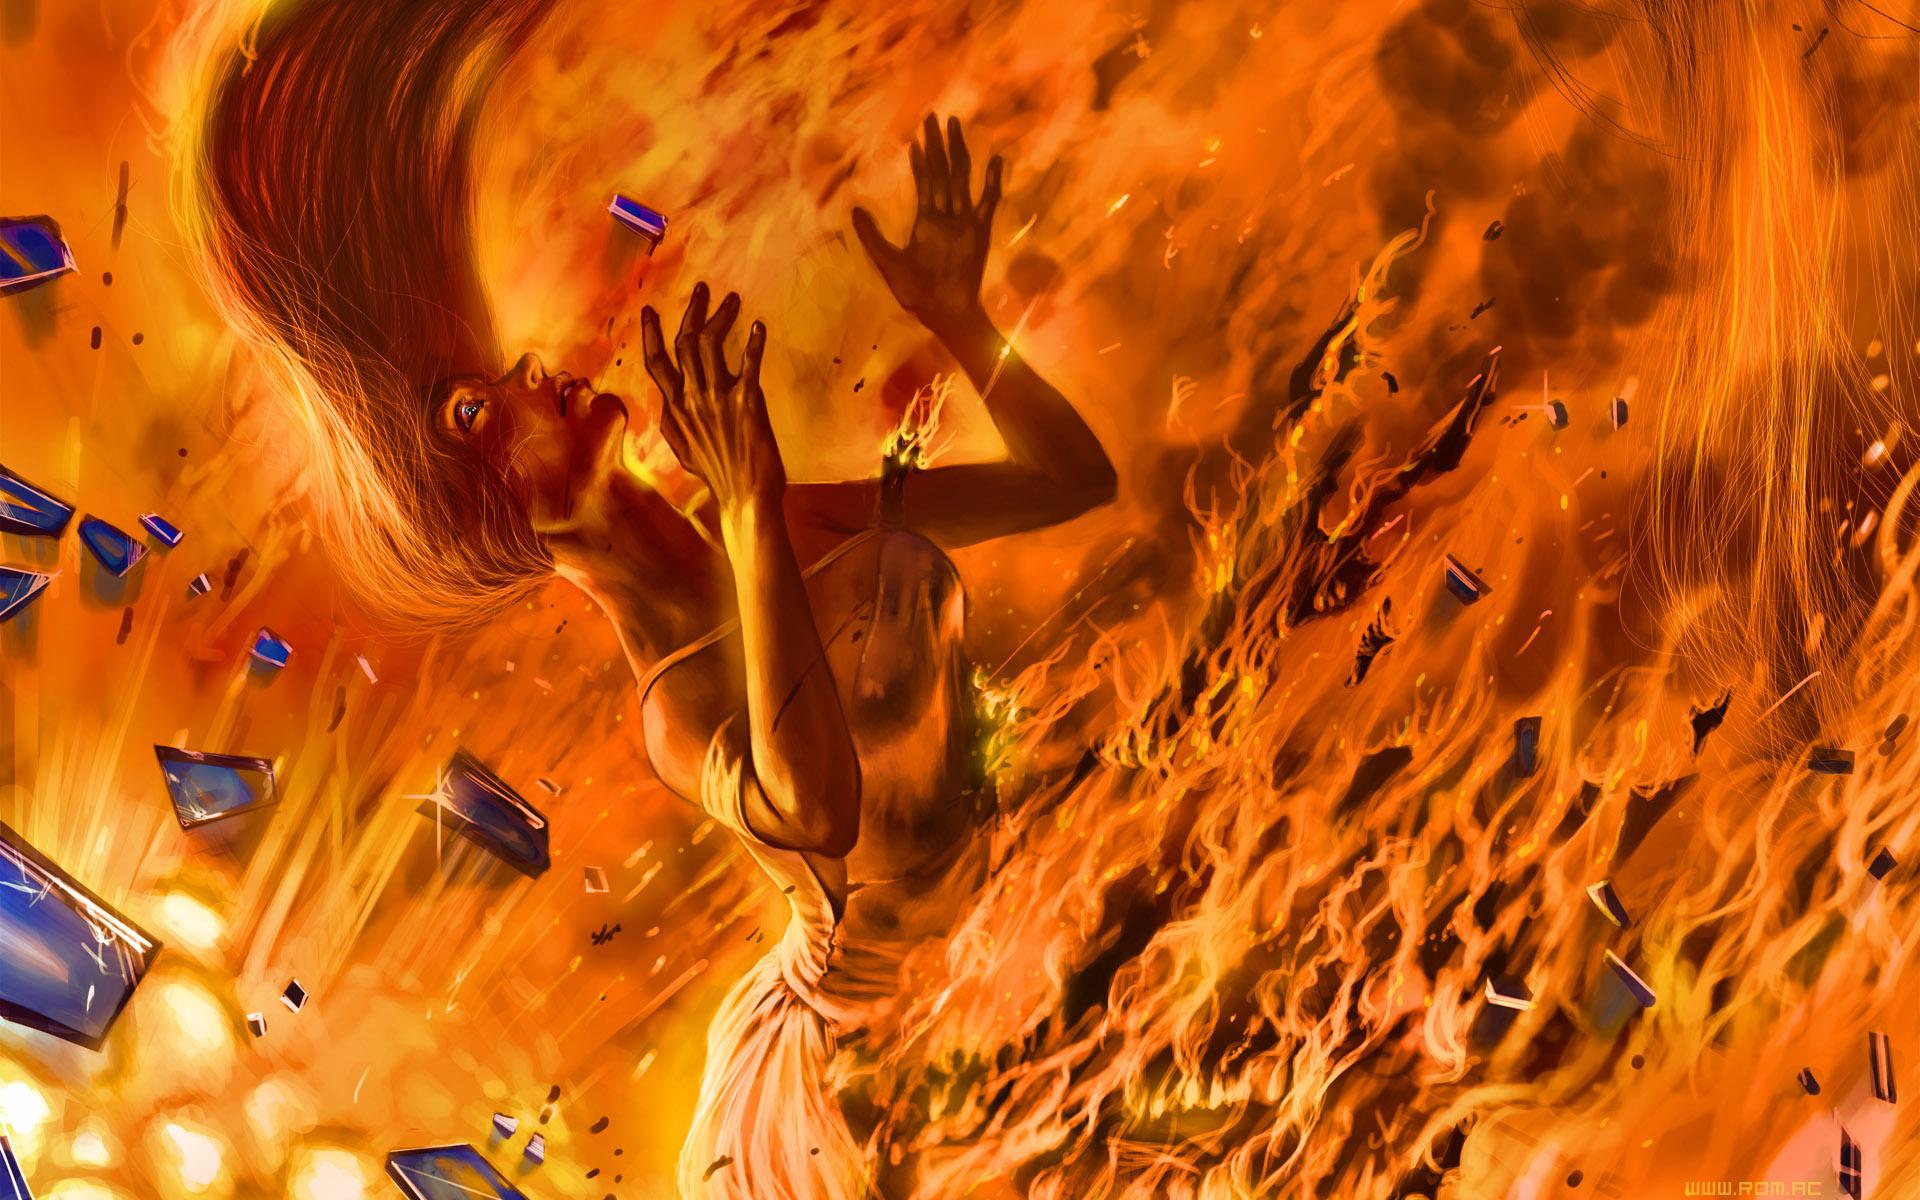 Hellfire by alexiuss